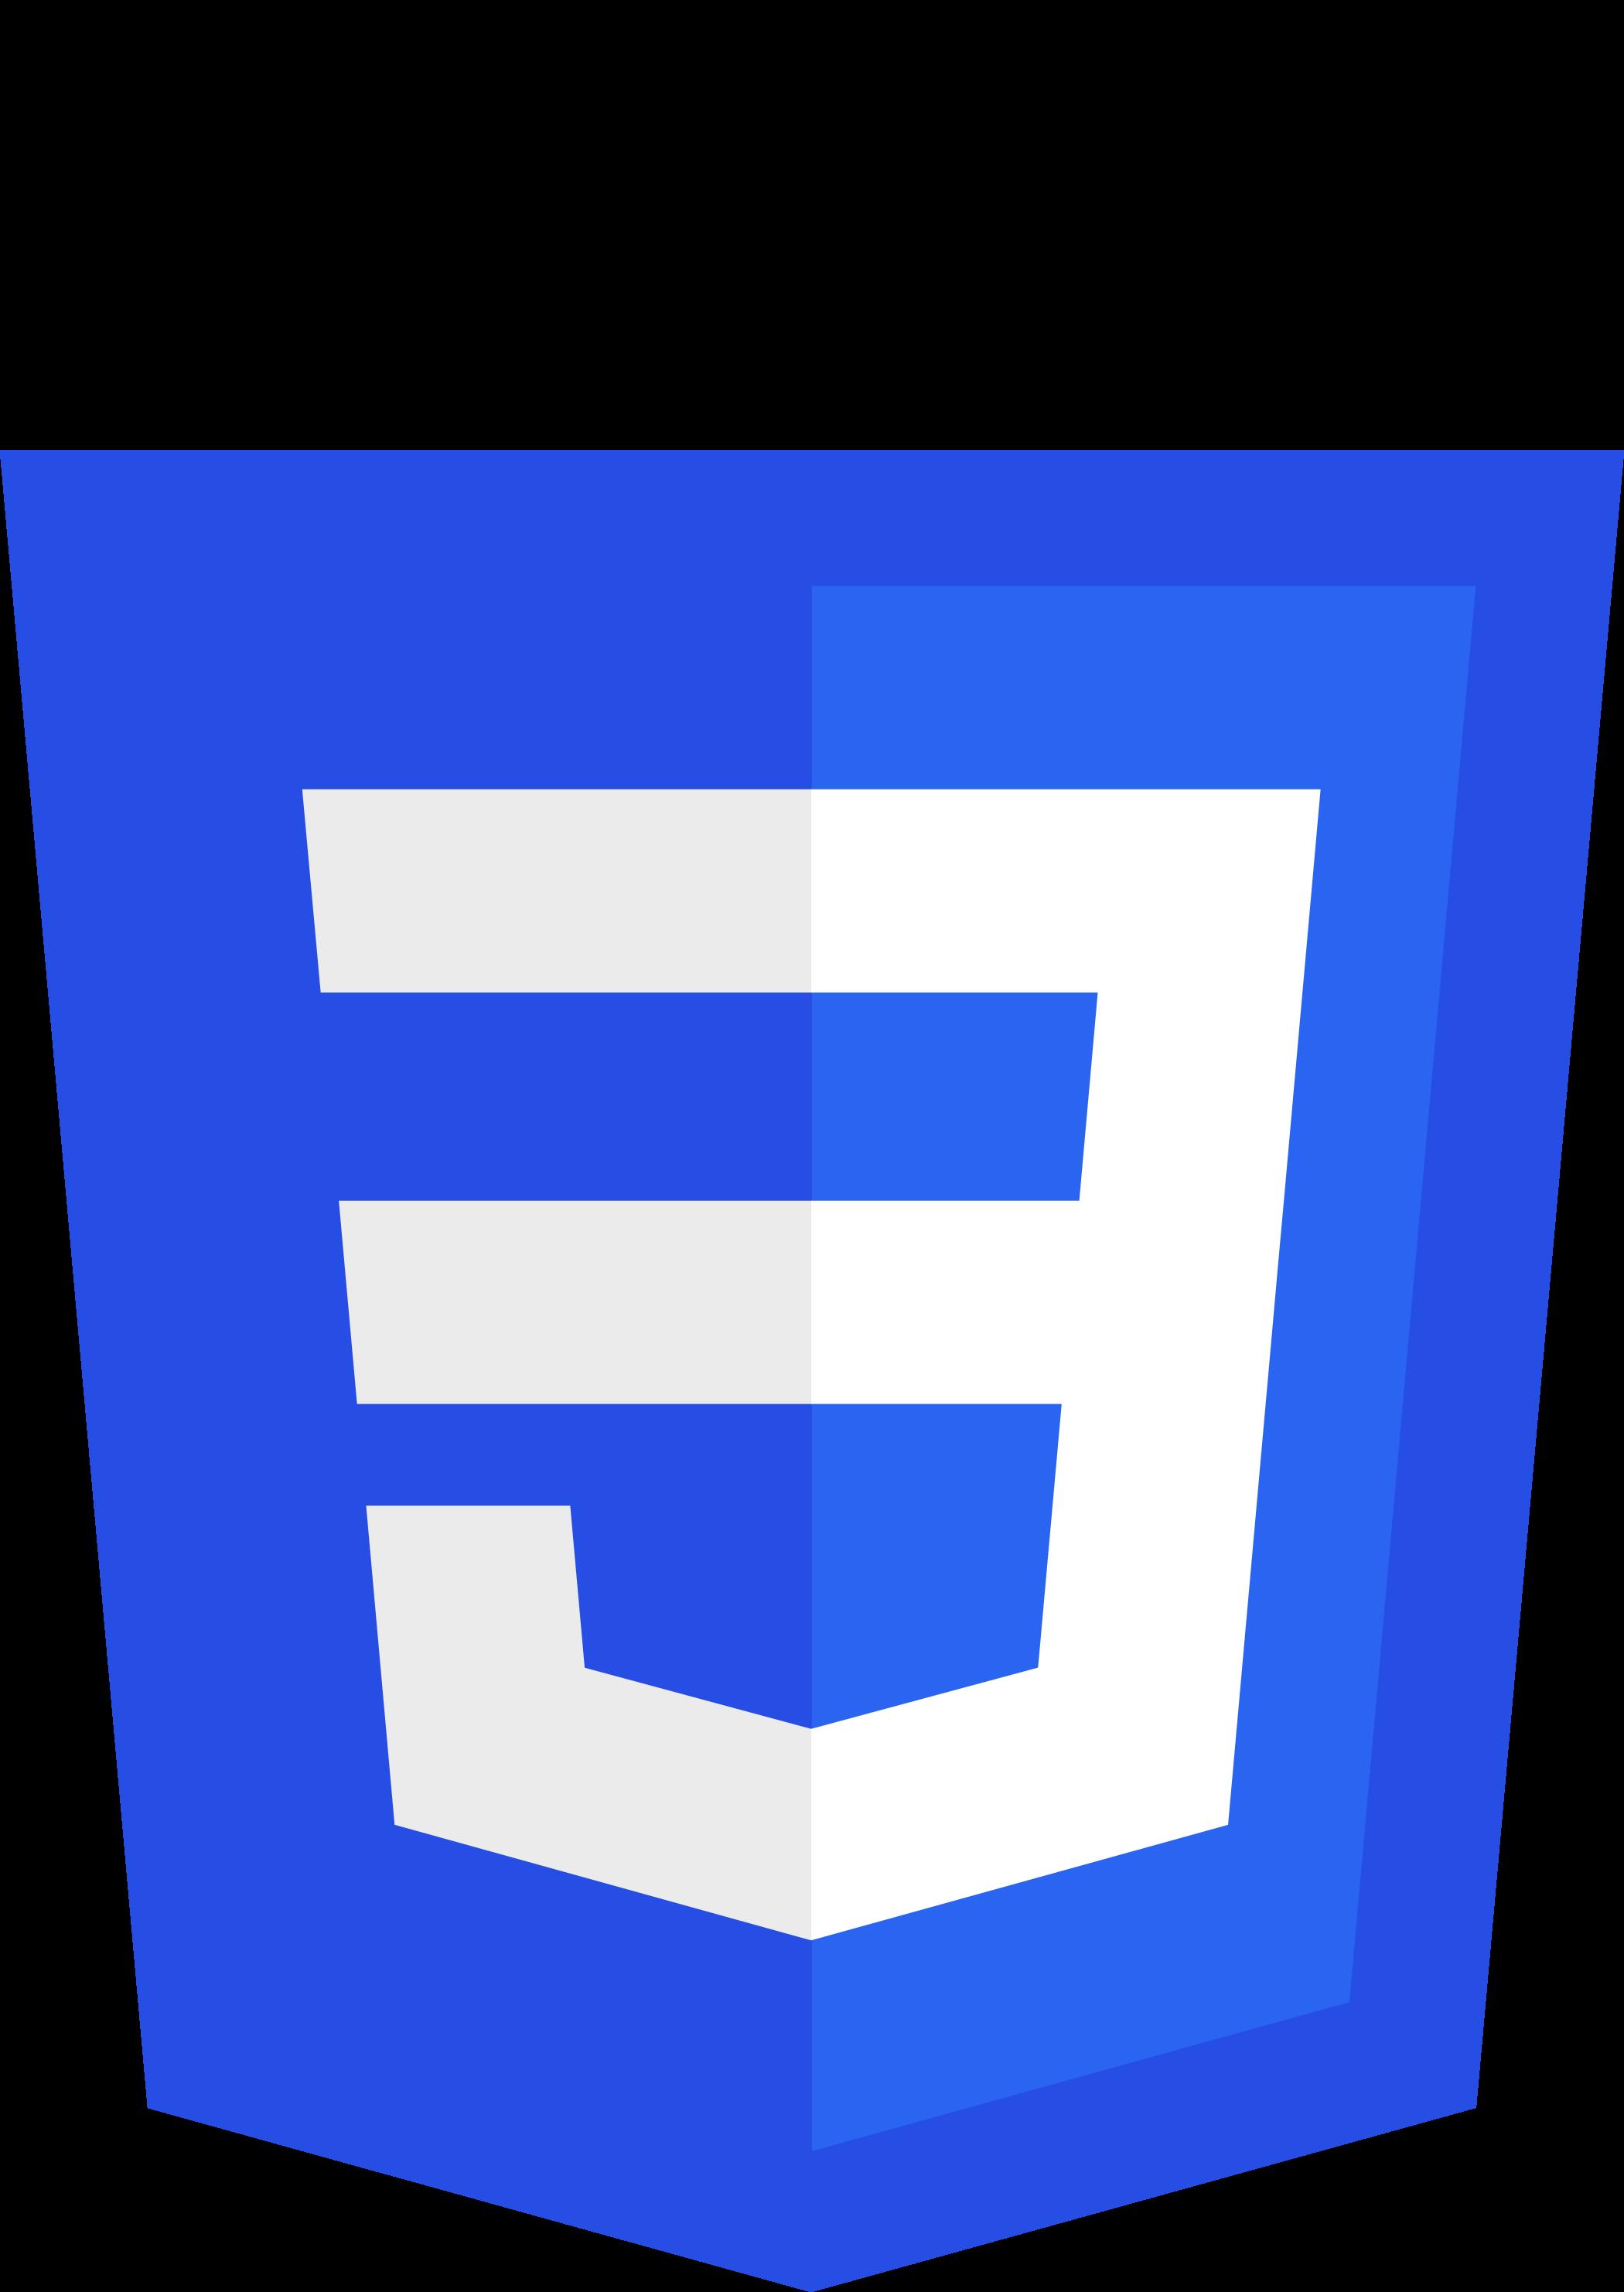 css3 logo logodownloadorg download de logotipos